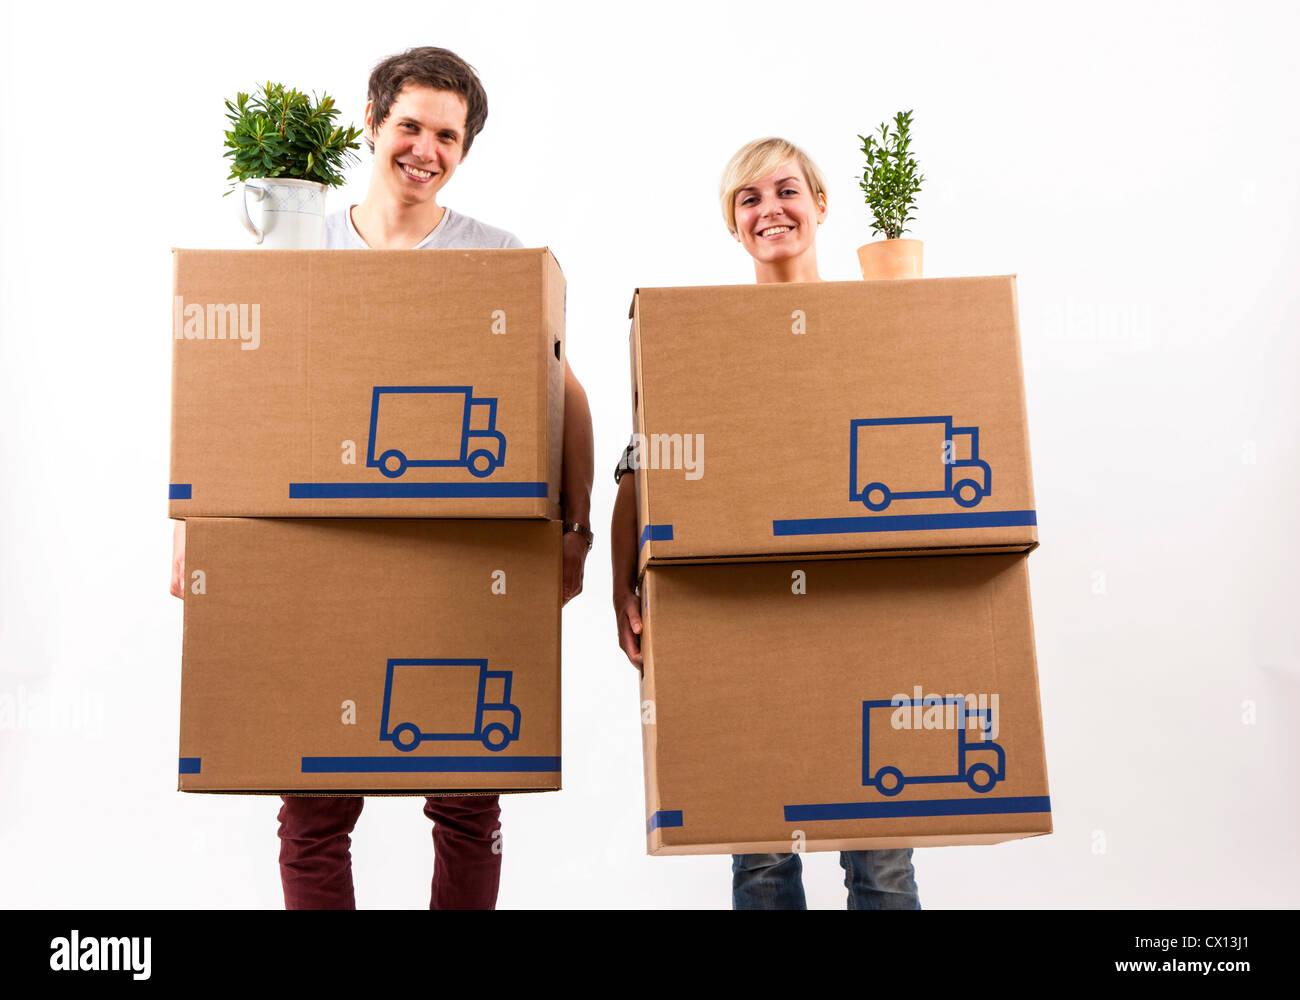 Symbolfoto Umzug, Auszug, umziehen. Junges Paar trägt Umzugskartons und Zimmerpflanze. Umzugskisten aus Pappkarton. Stock Photo